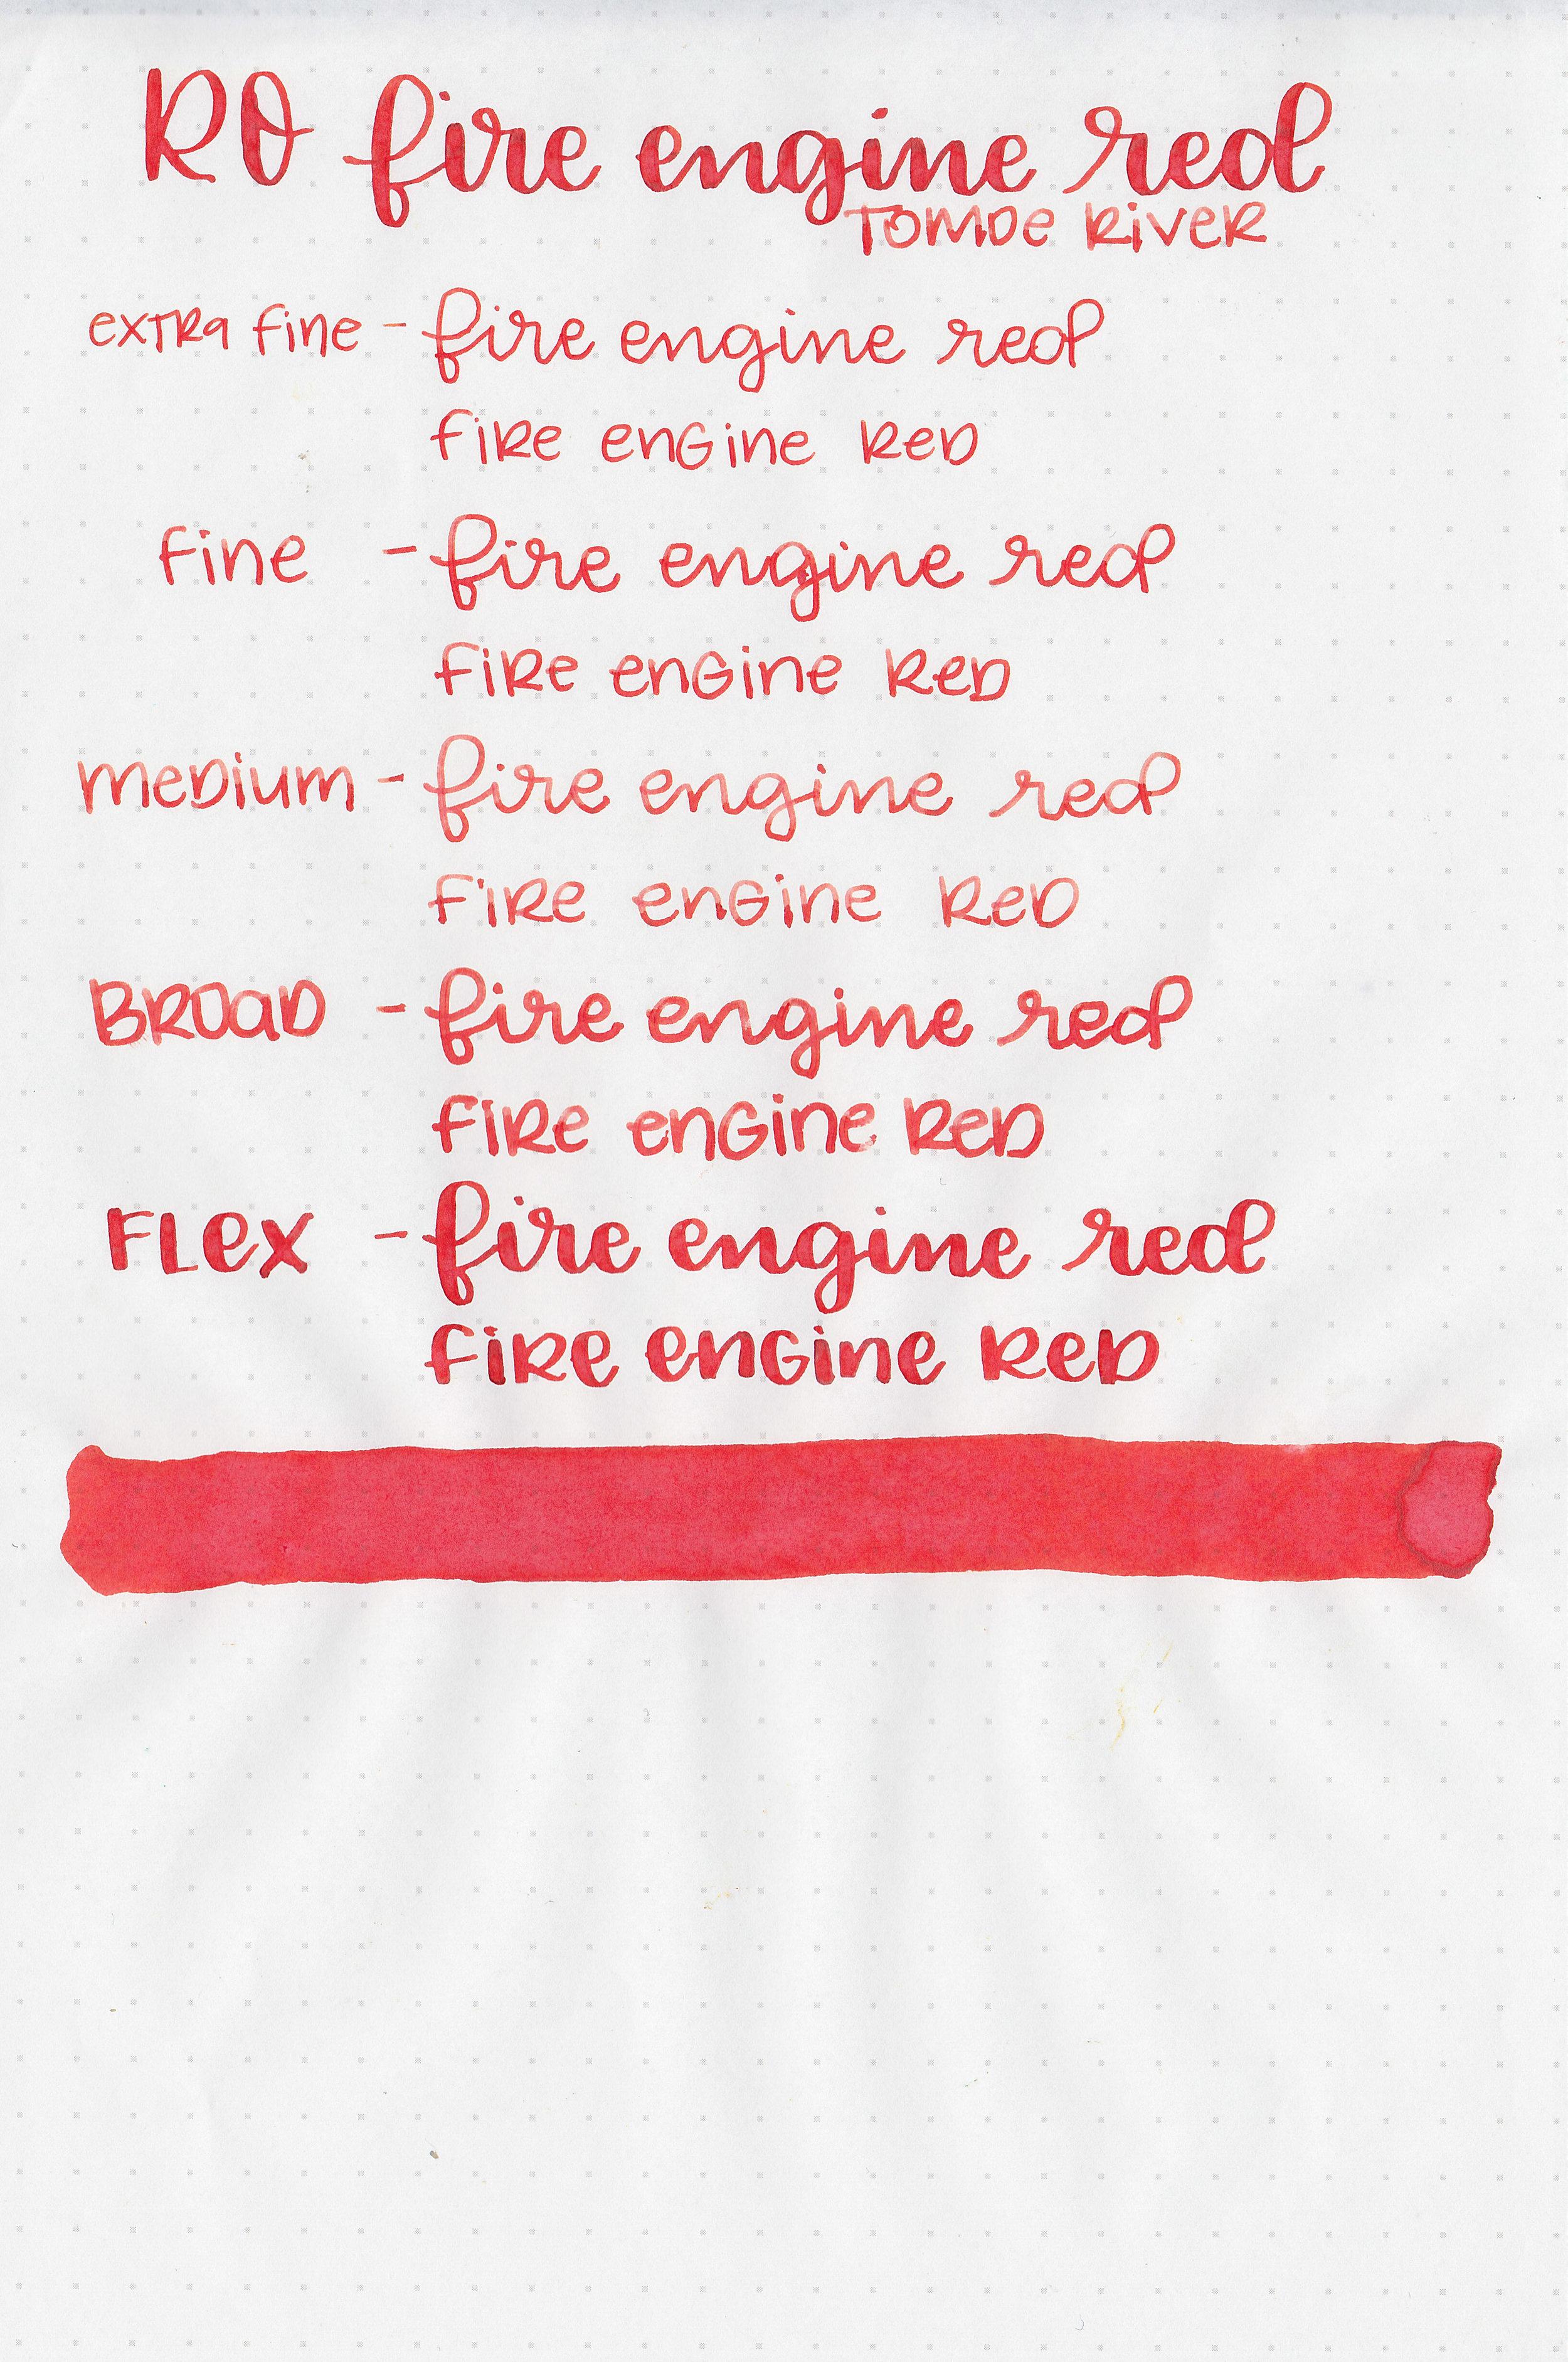 ro-fire-engine-red-10.jpg